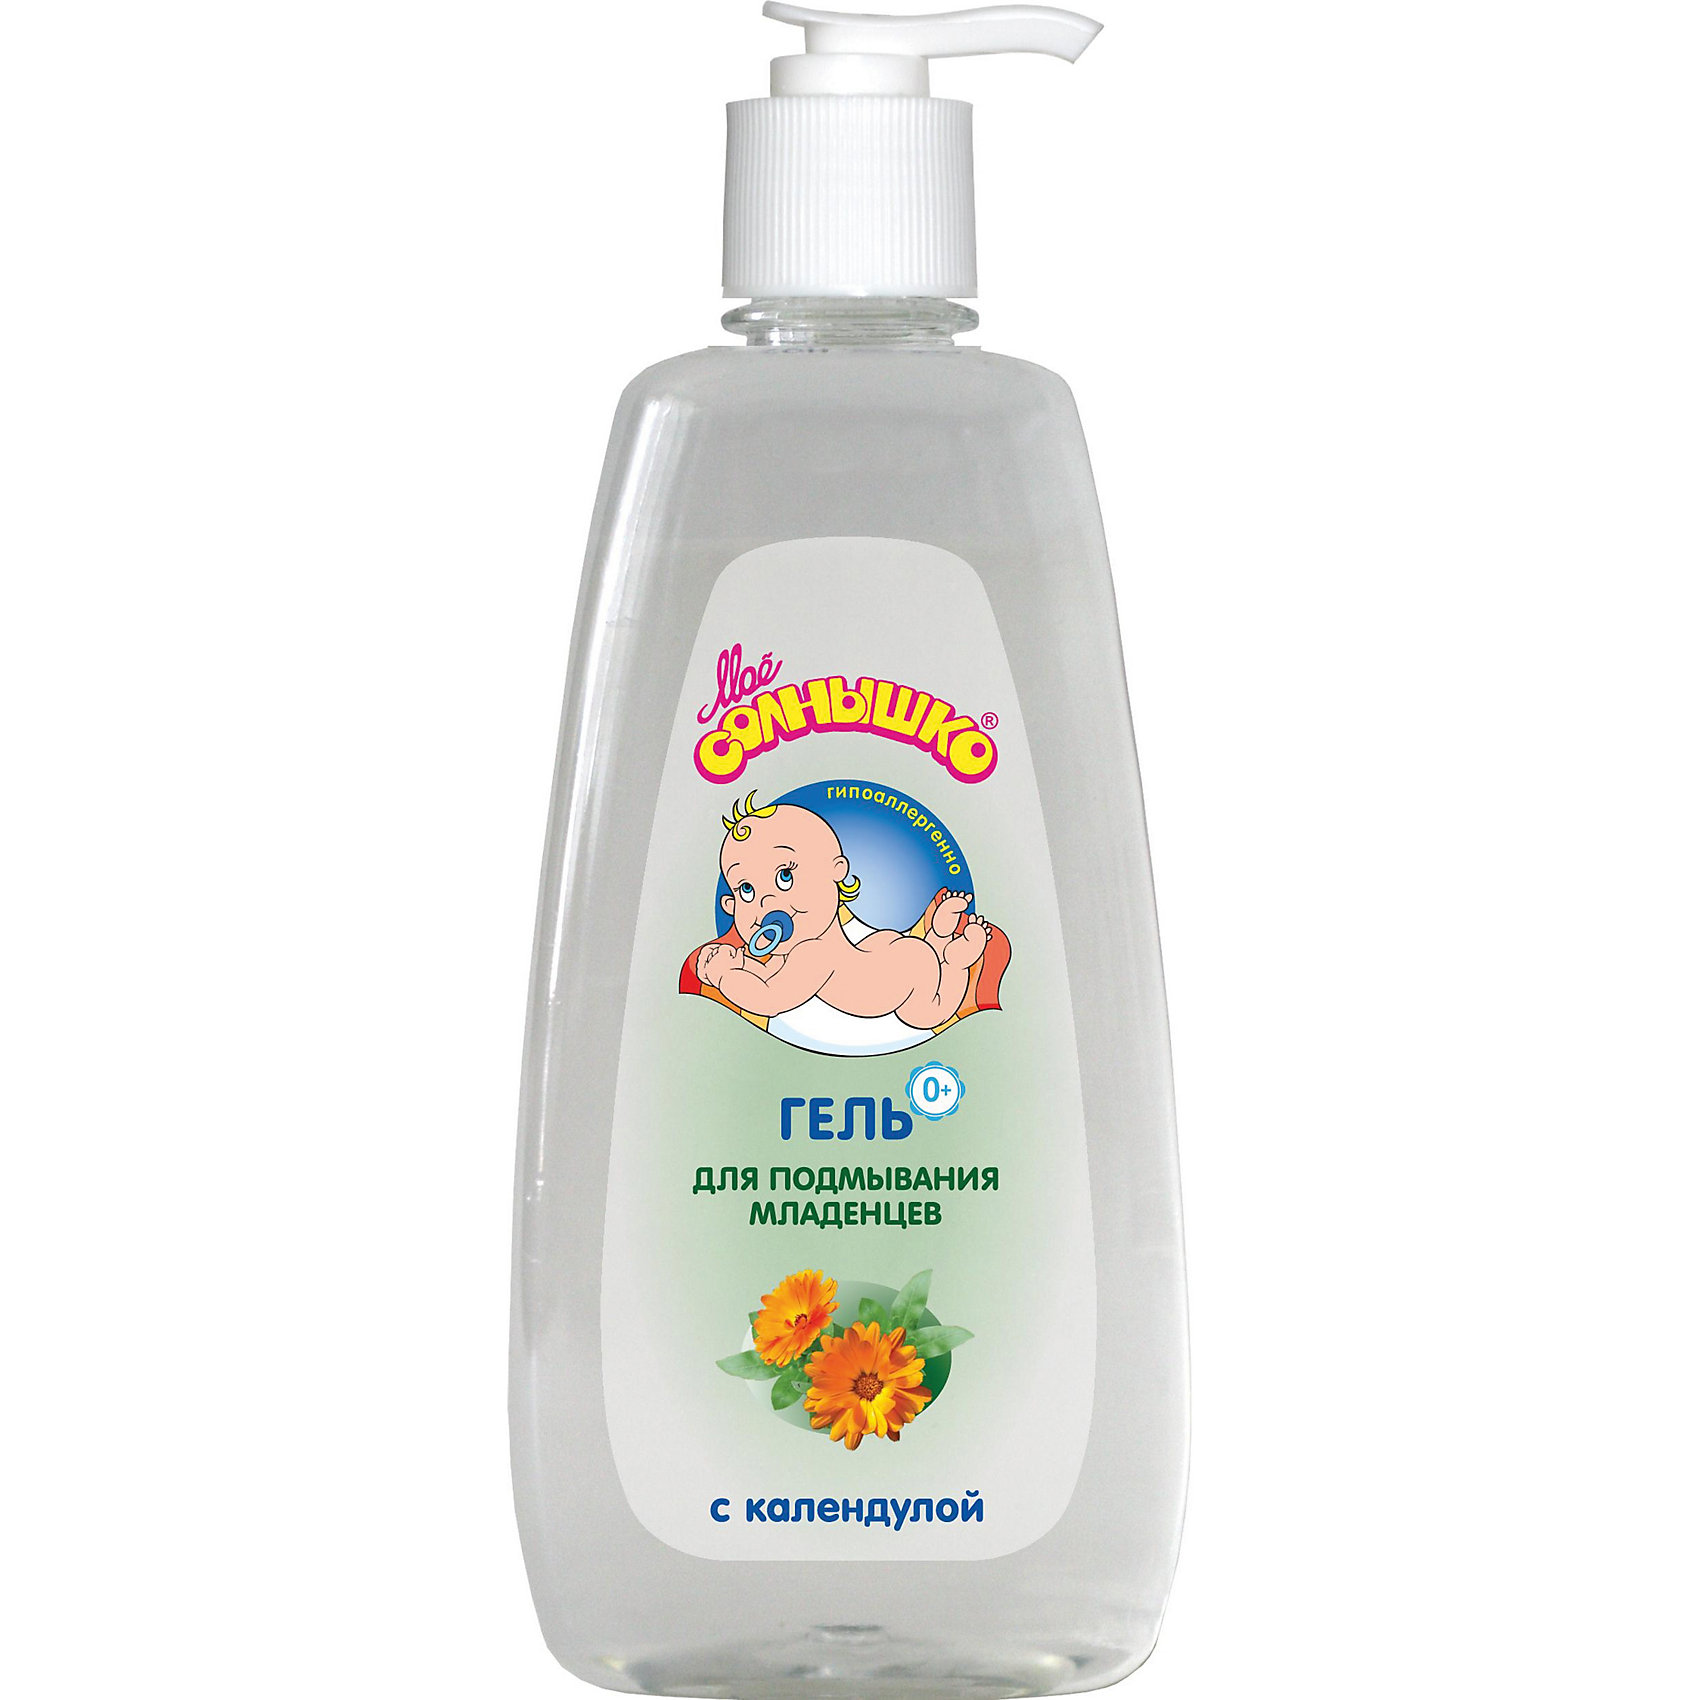 Моё солнышко Гель для подмывания младенцев с календулой 400 мл., МОЁ СОЛНЫШКО моё солнышко для подмывания младенцев 200 мл